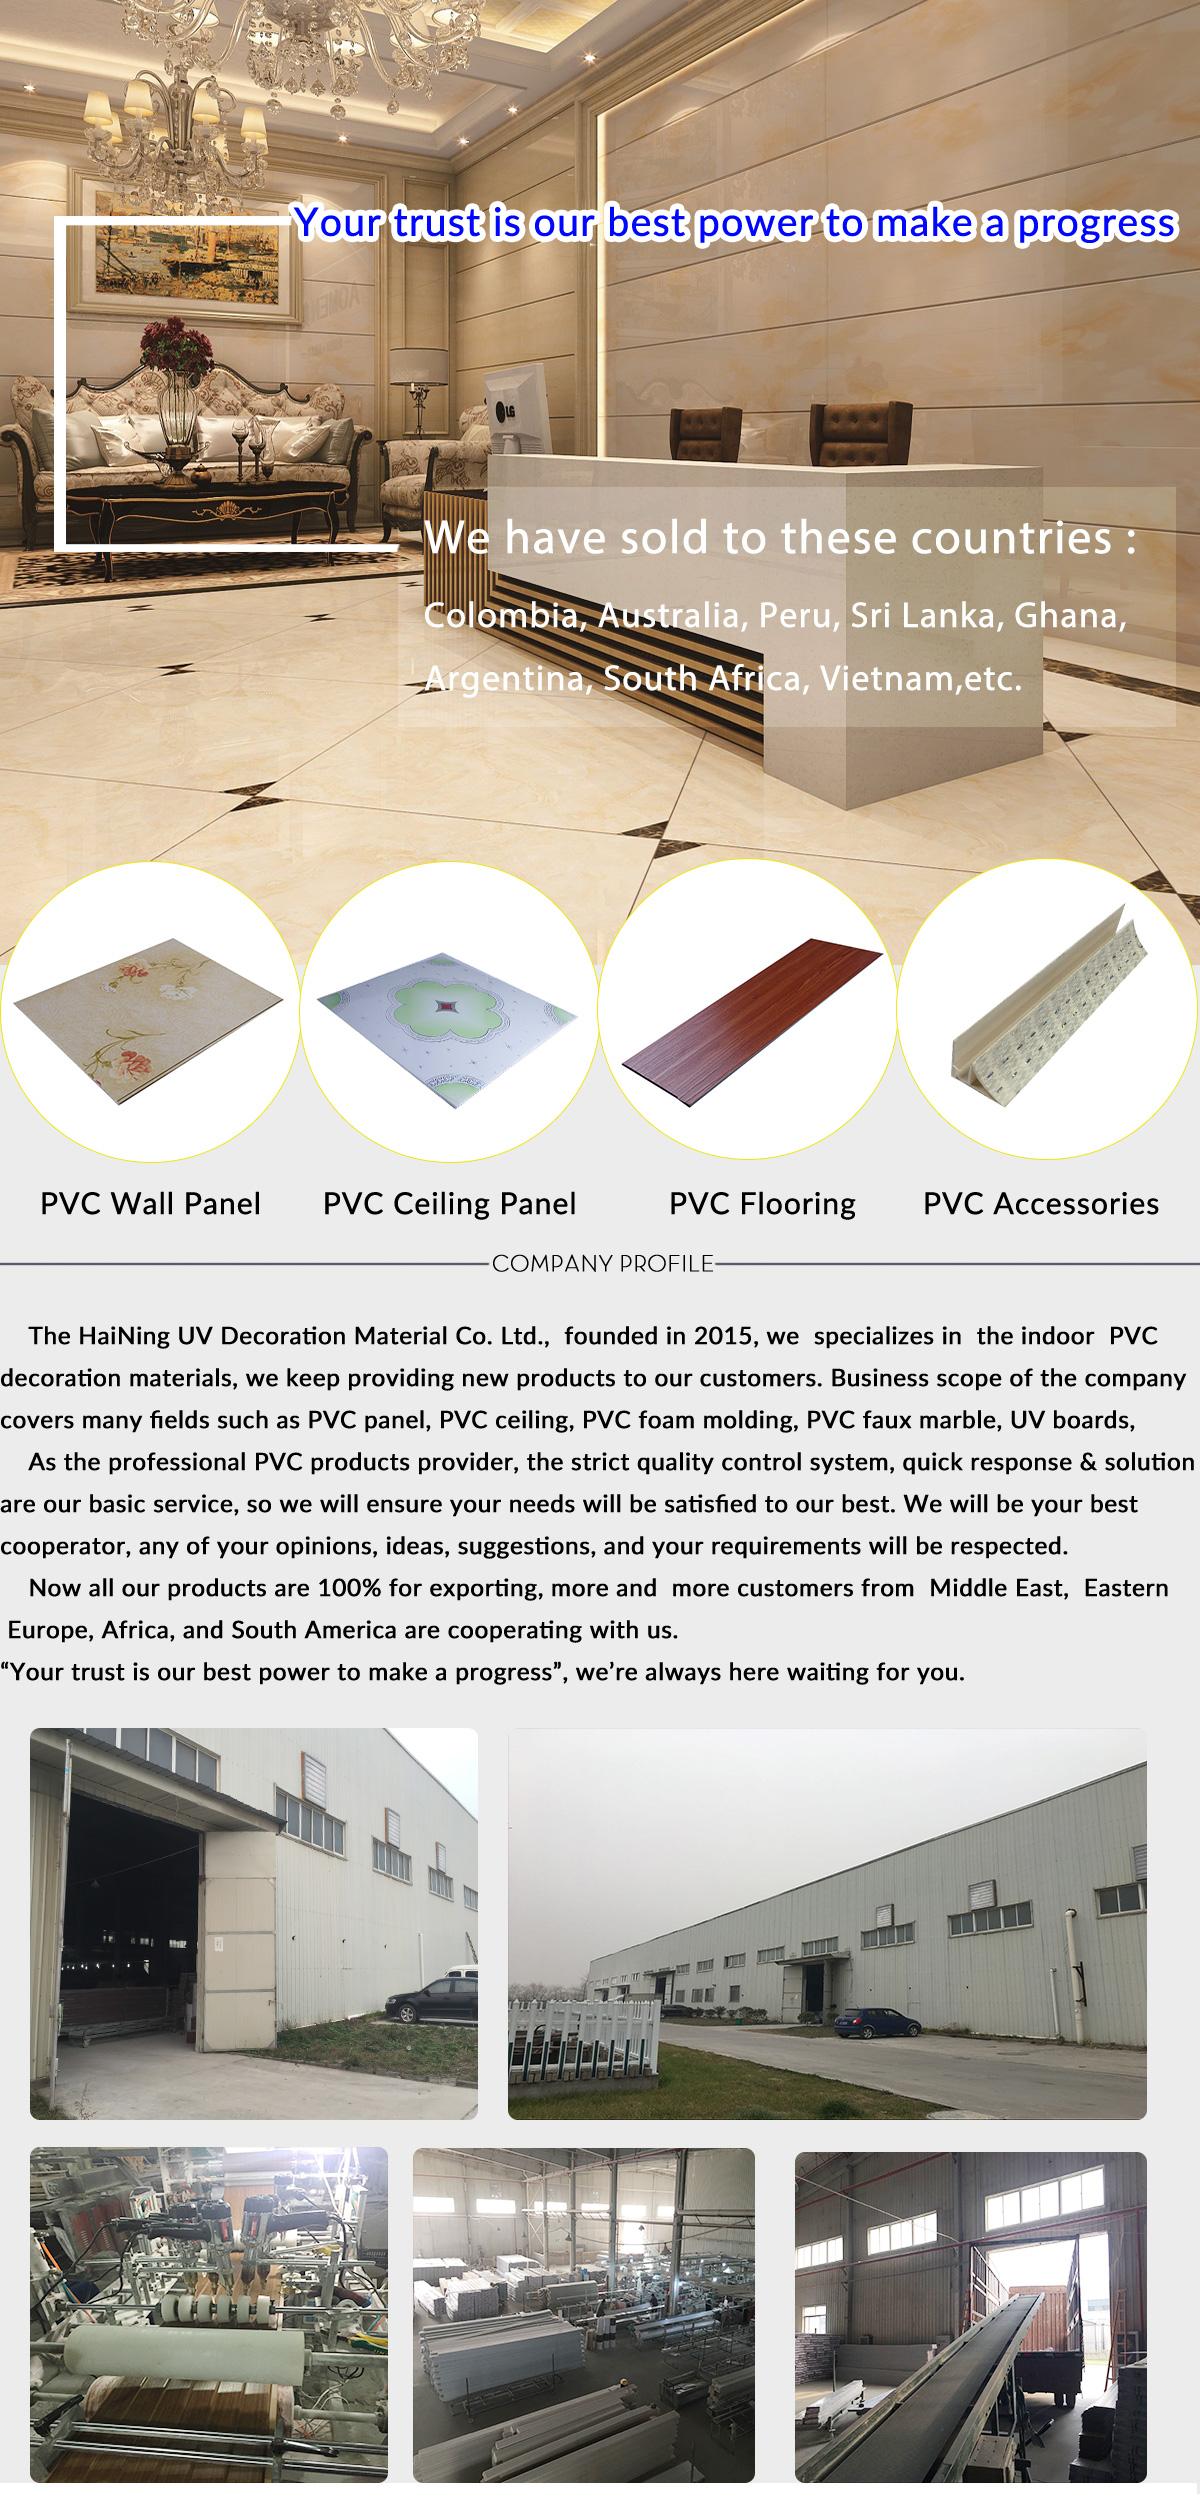 Haining UV Decoration Material Co., Ltd. - pvc panel, pvc ceiling